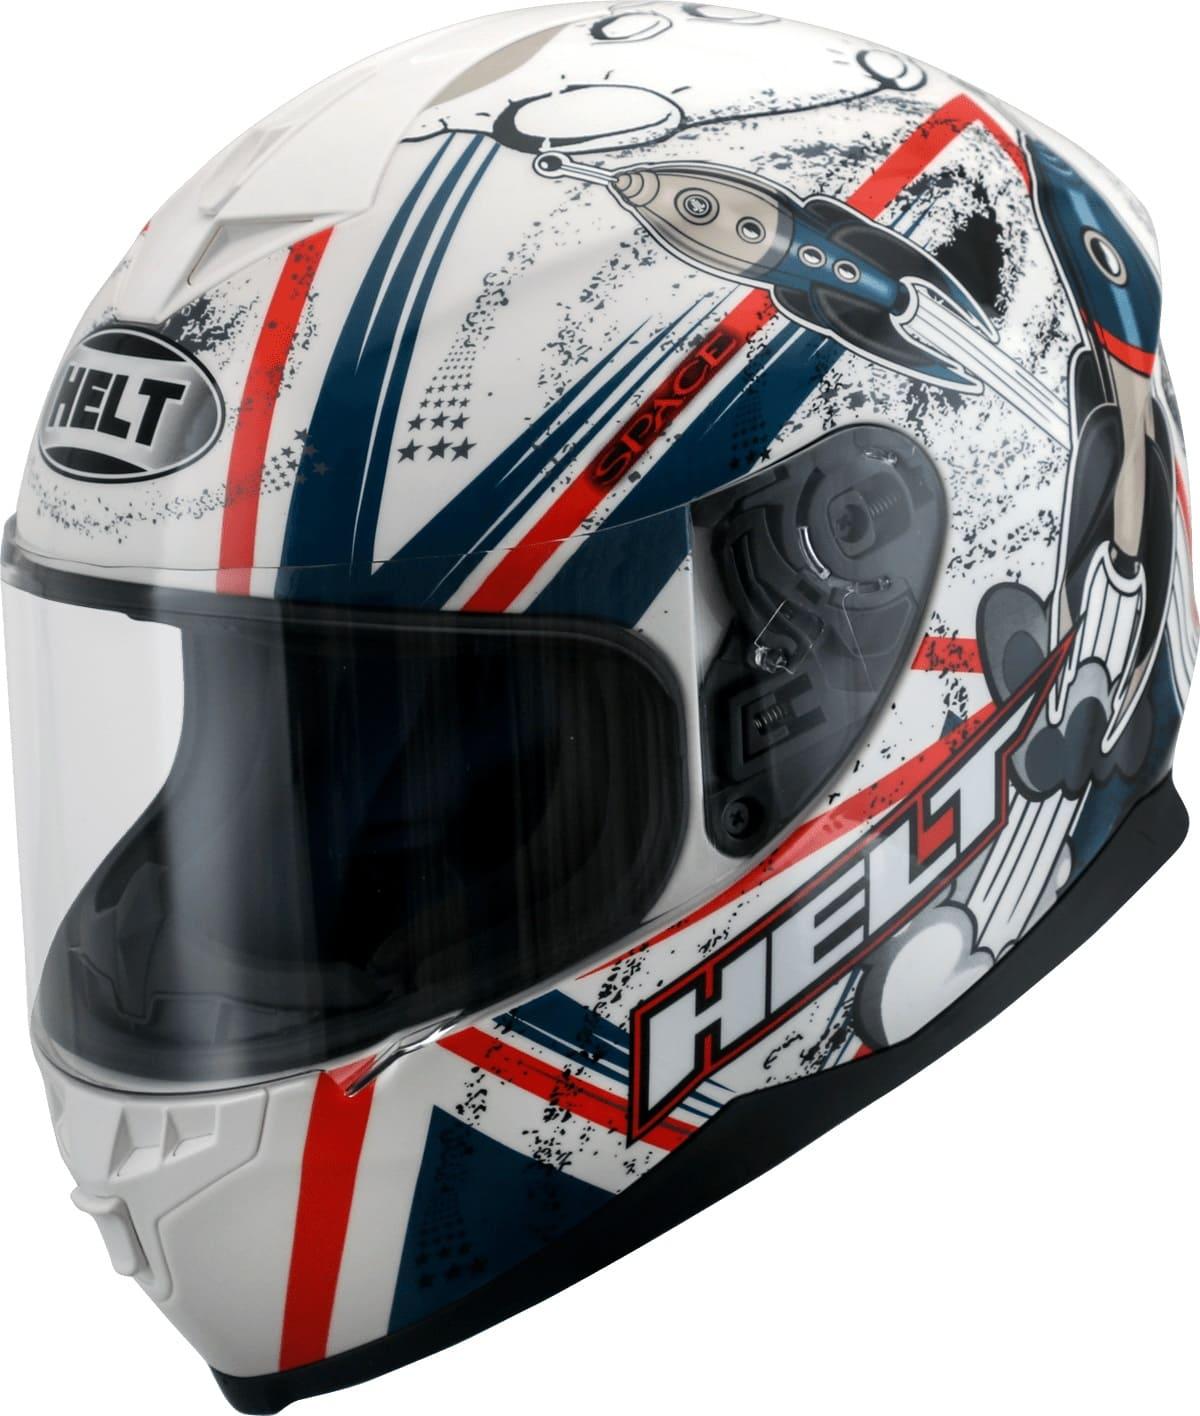 Capacete Helt 967 New Race Space  Vermelho/Branco